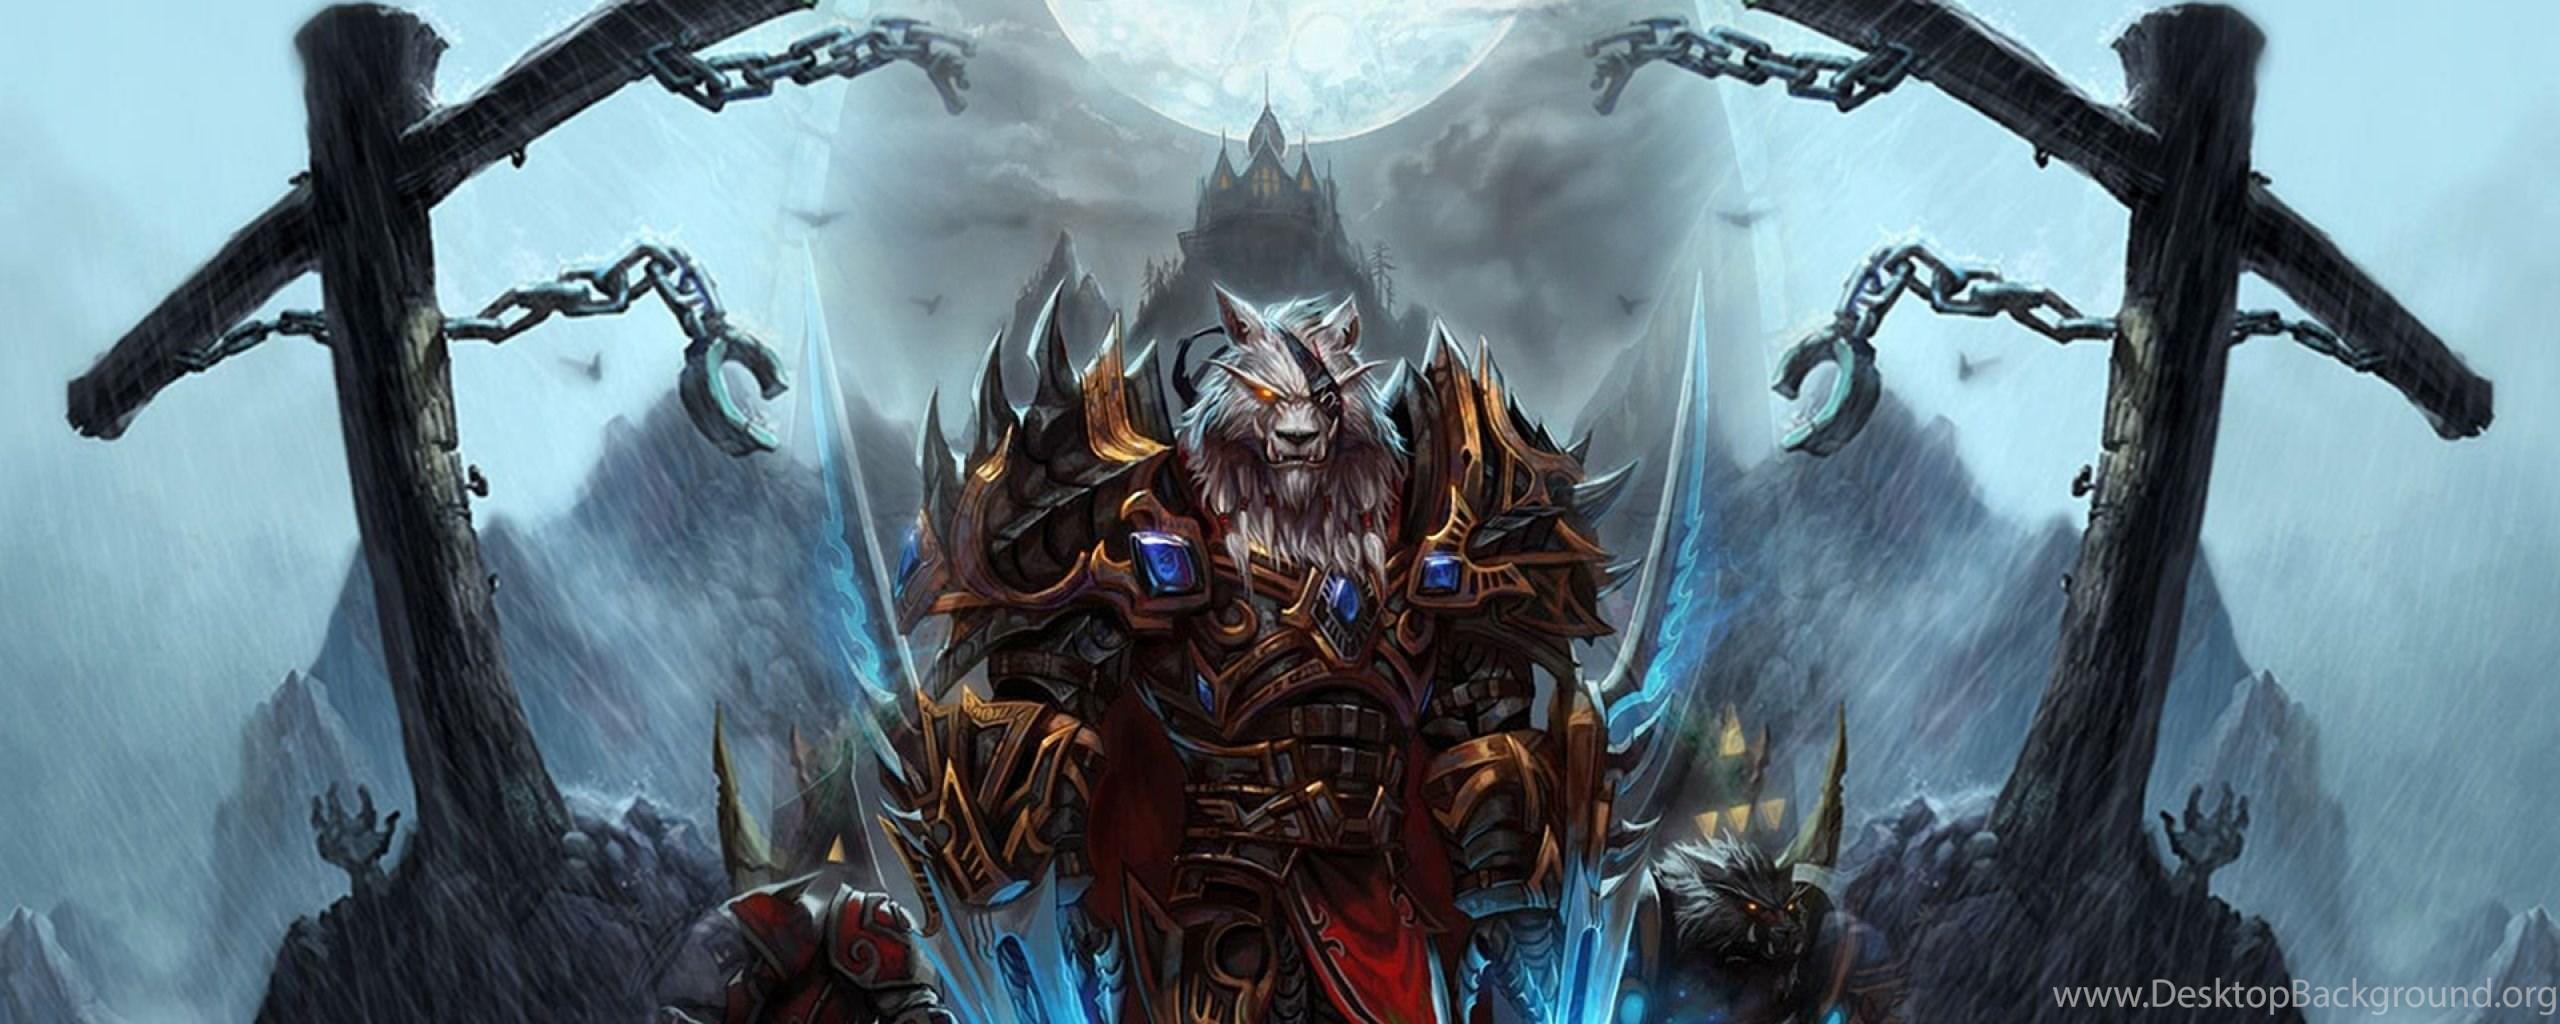 Dual Monitor Resolution World Of Warcraft Wallpapers Hd Desktop